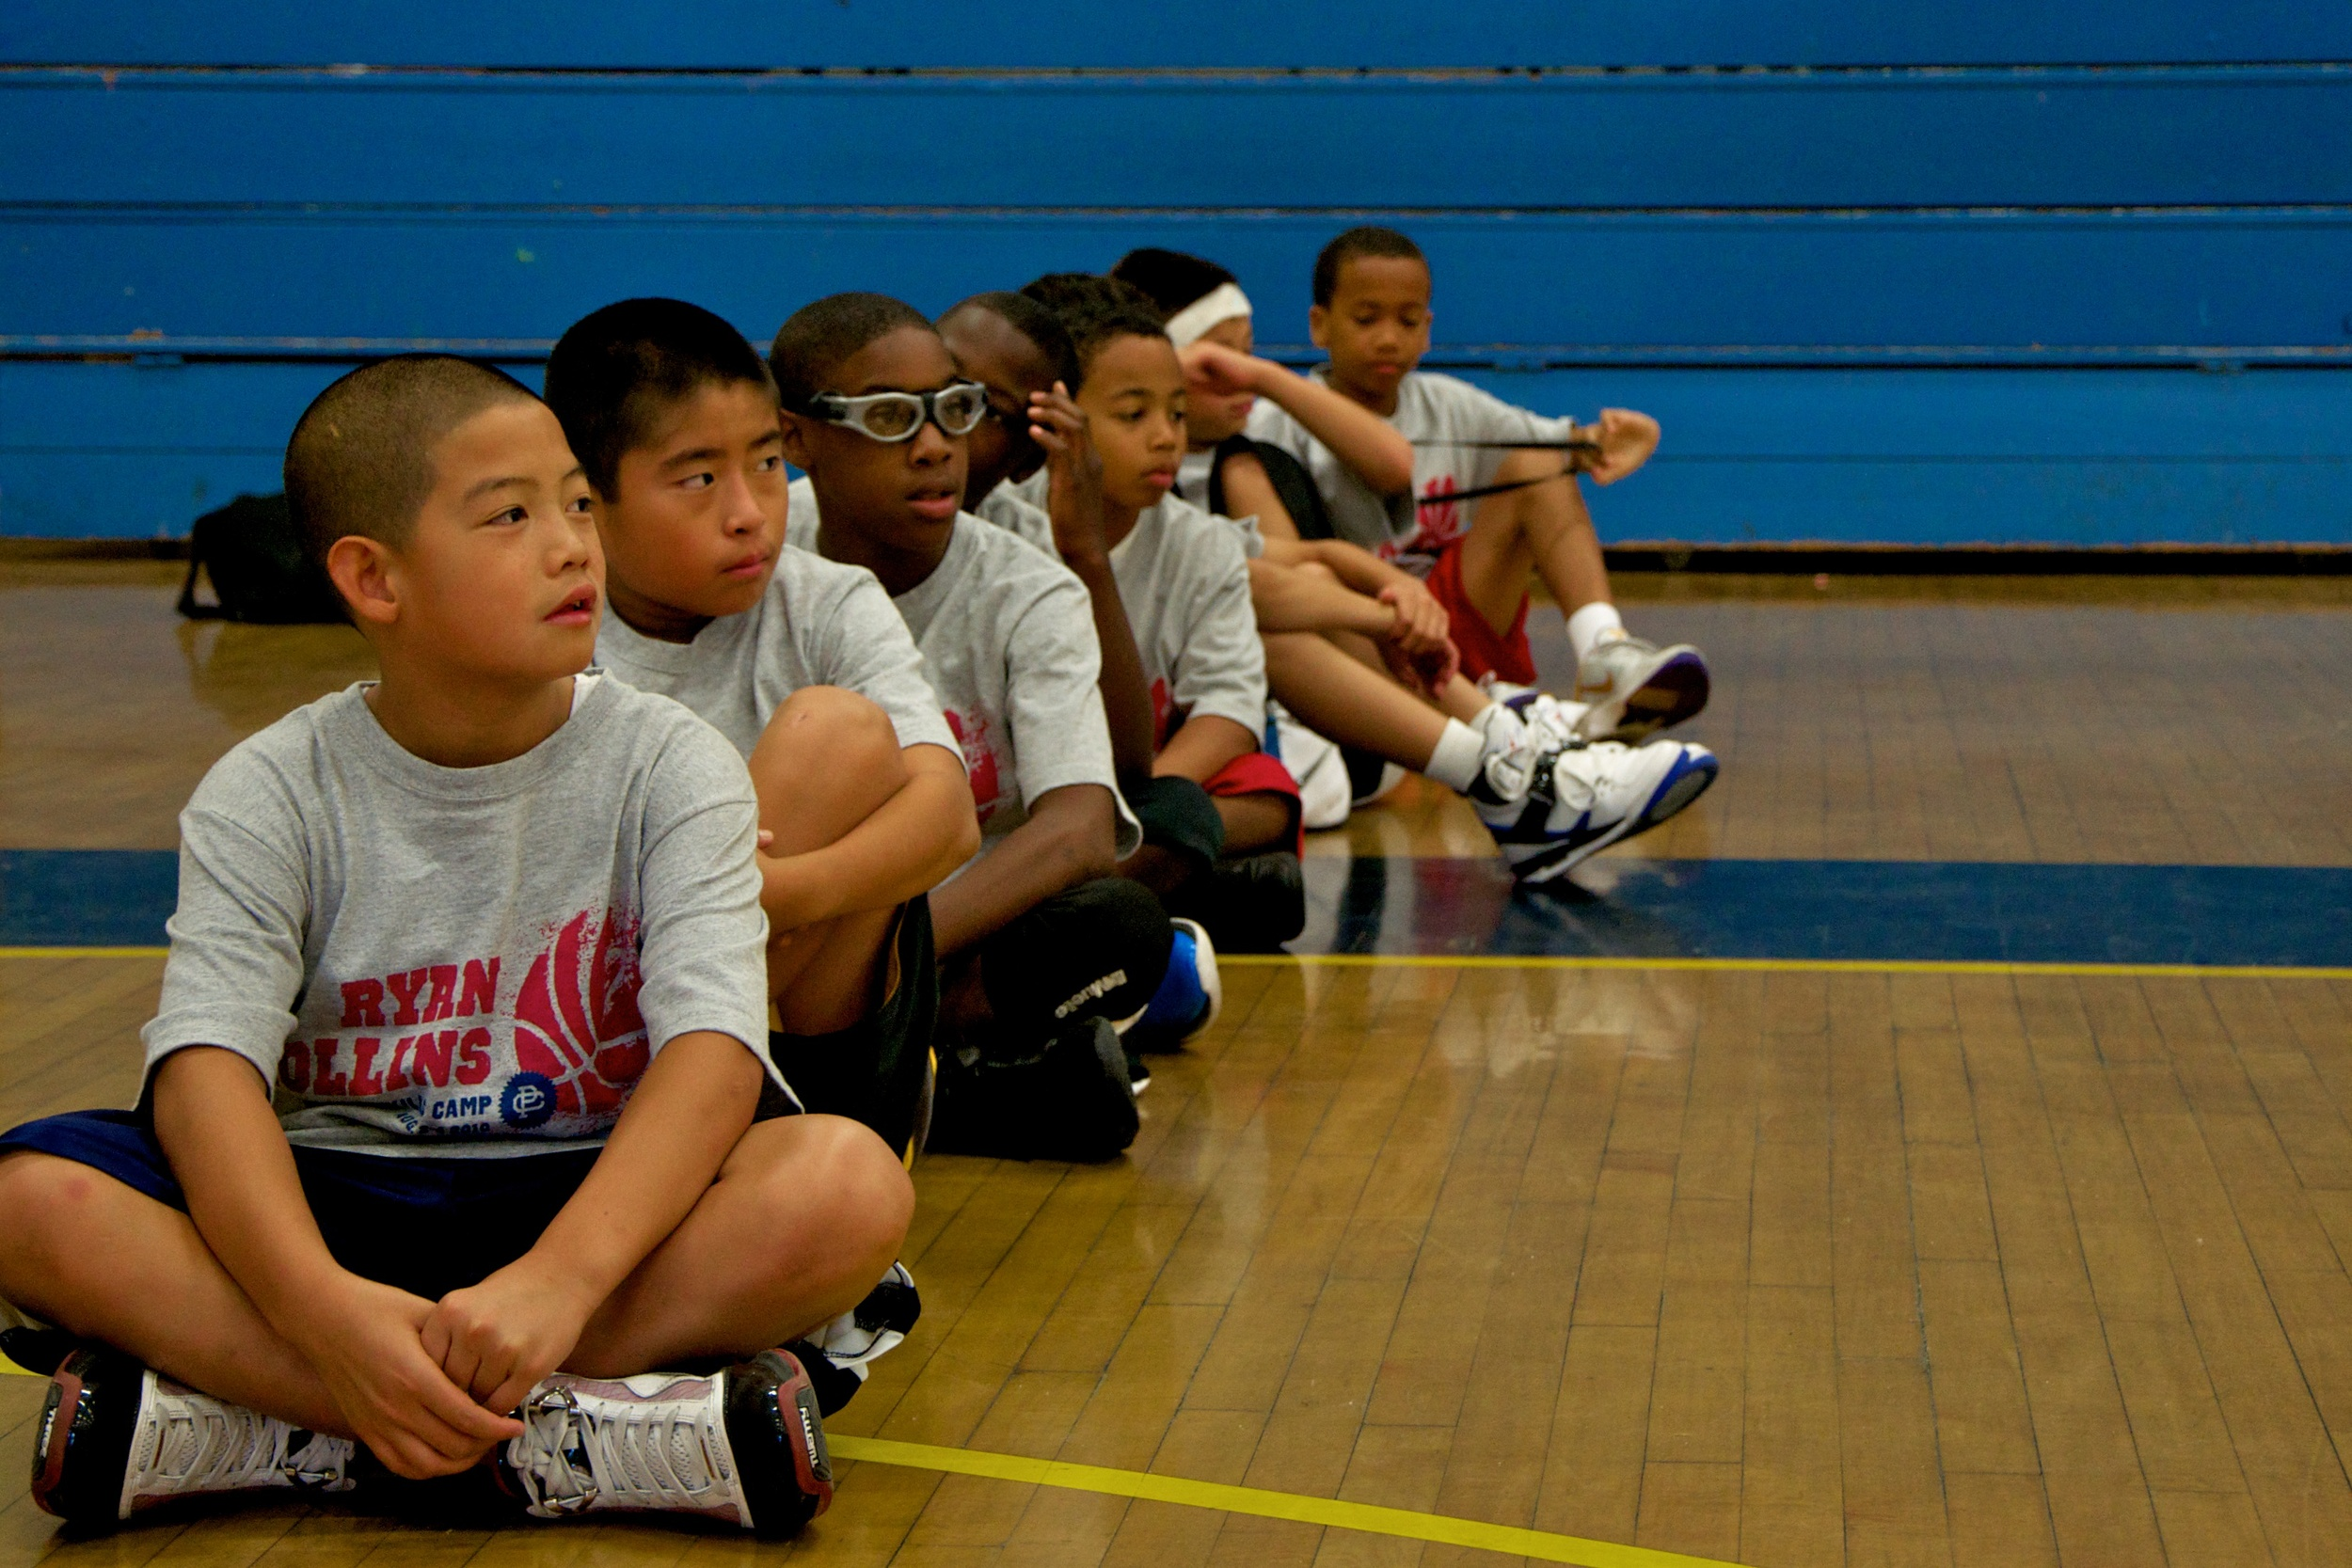 Ryan Hollins Basketball Camp 24.jpg